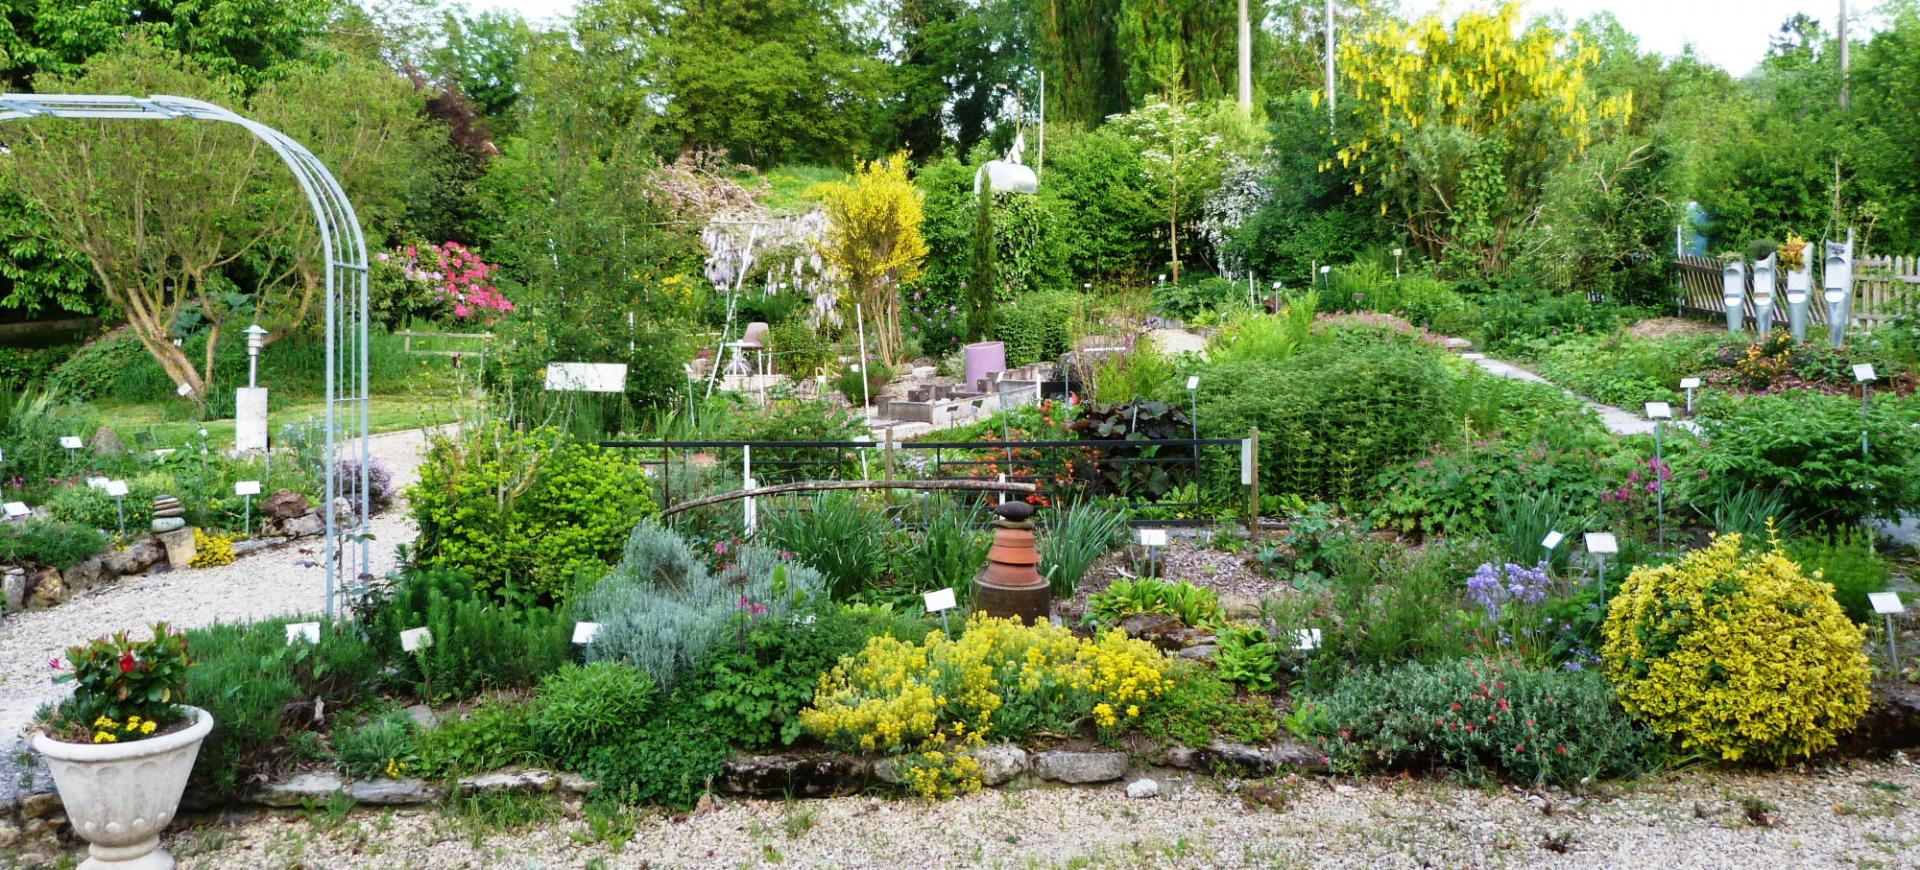 Jardin 2014 3